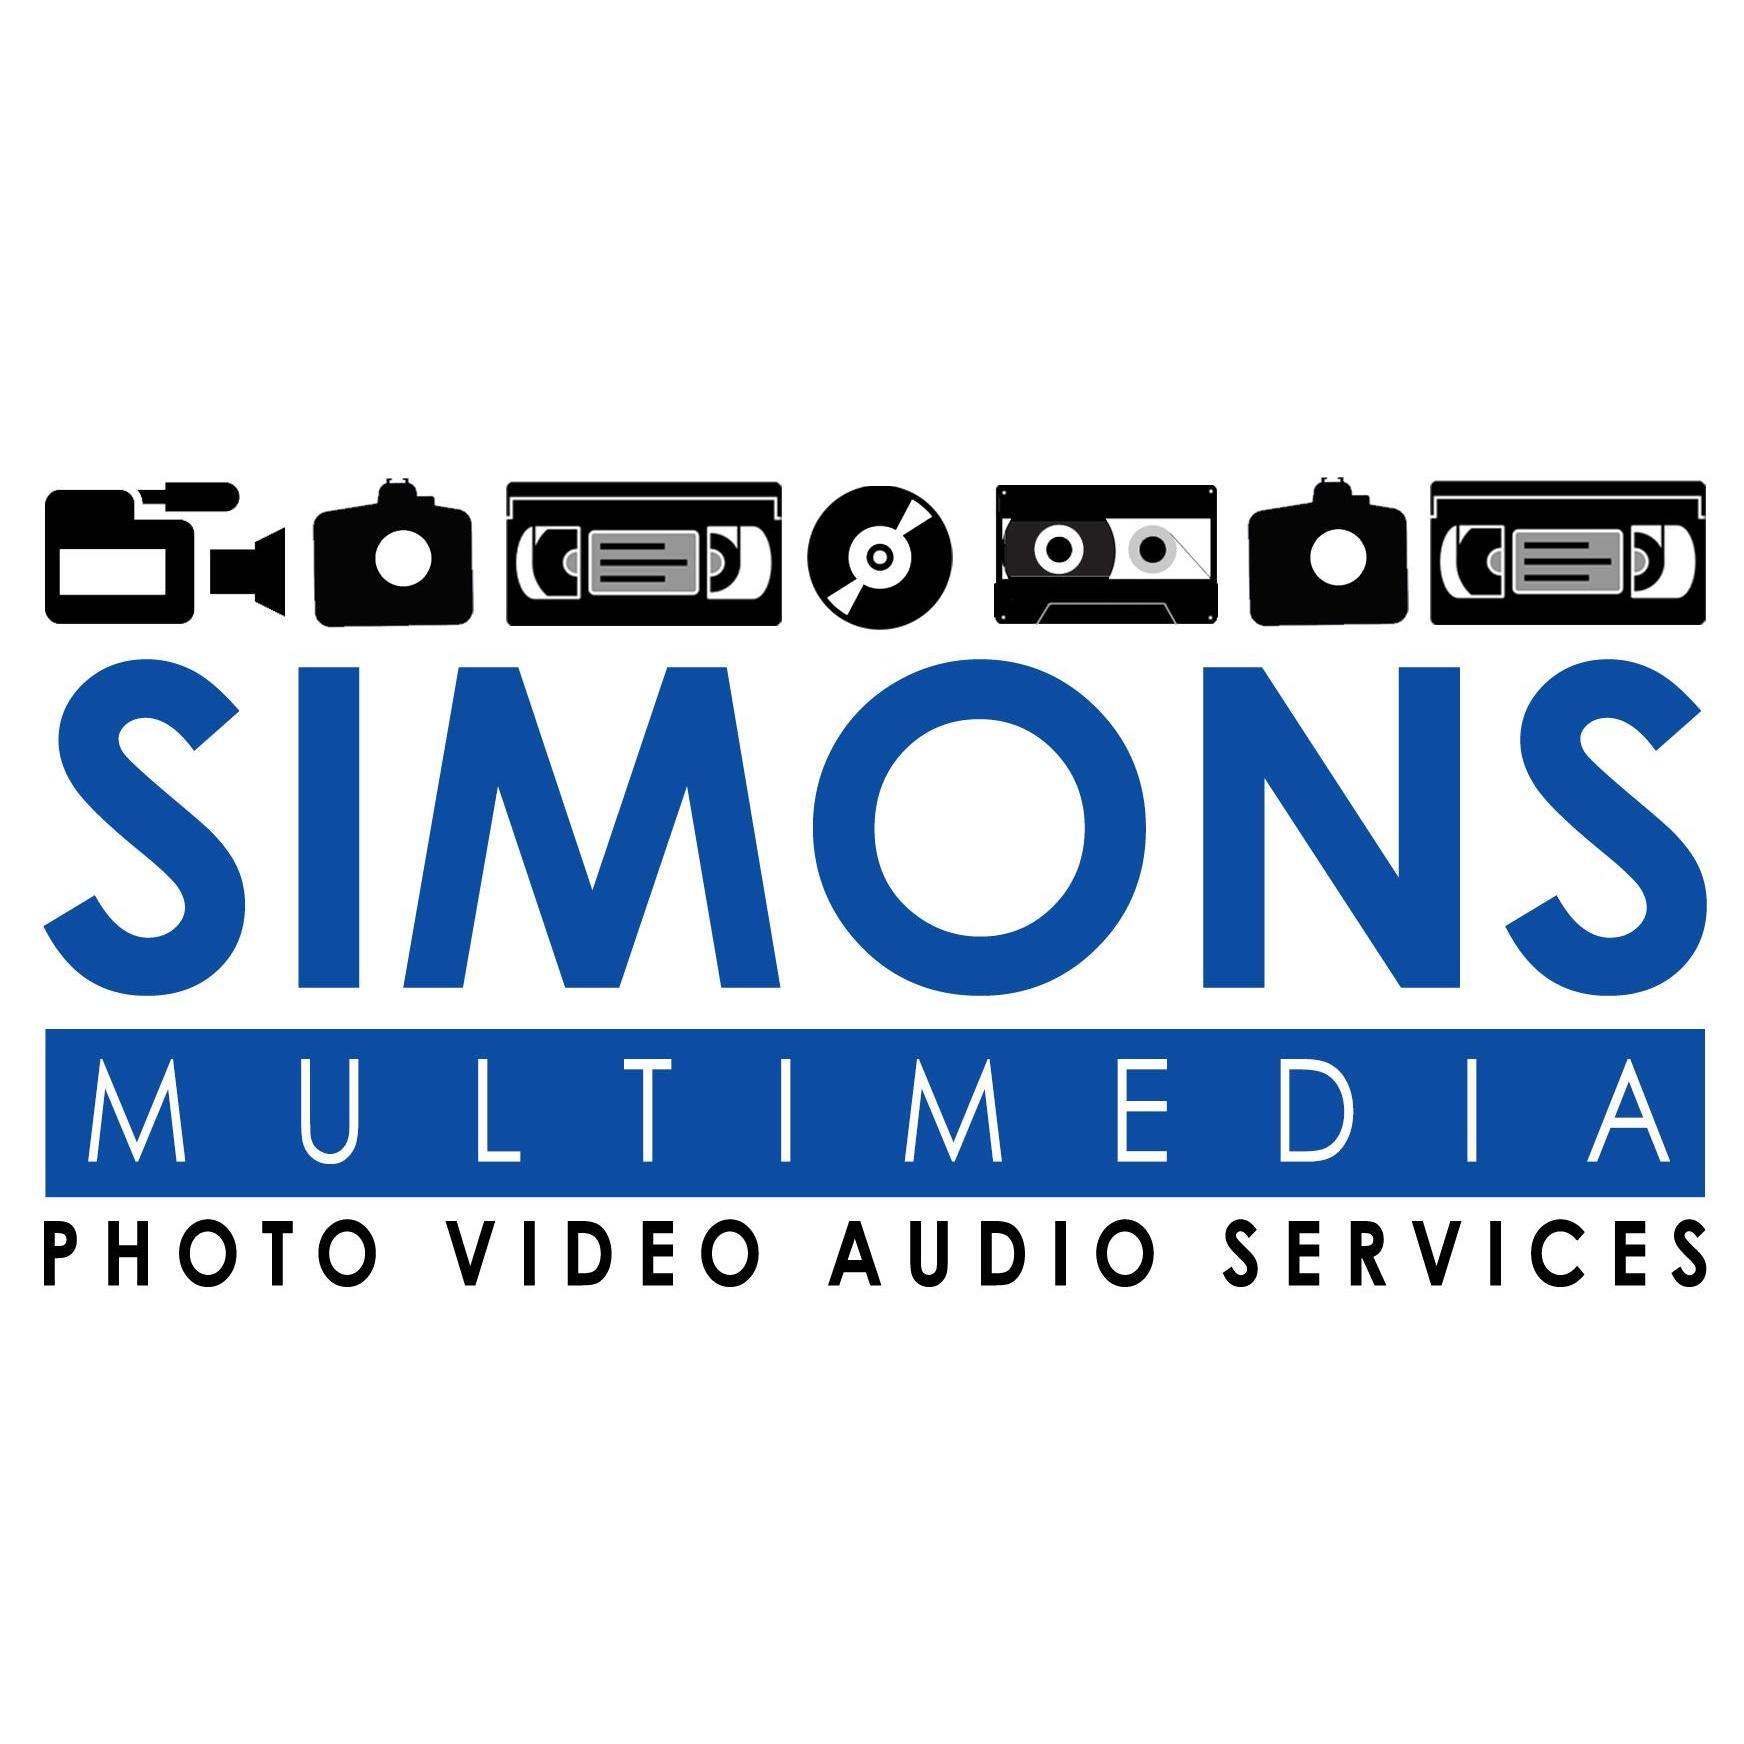 Simons Multimedia